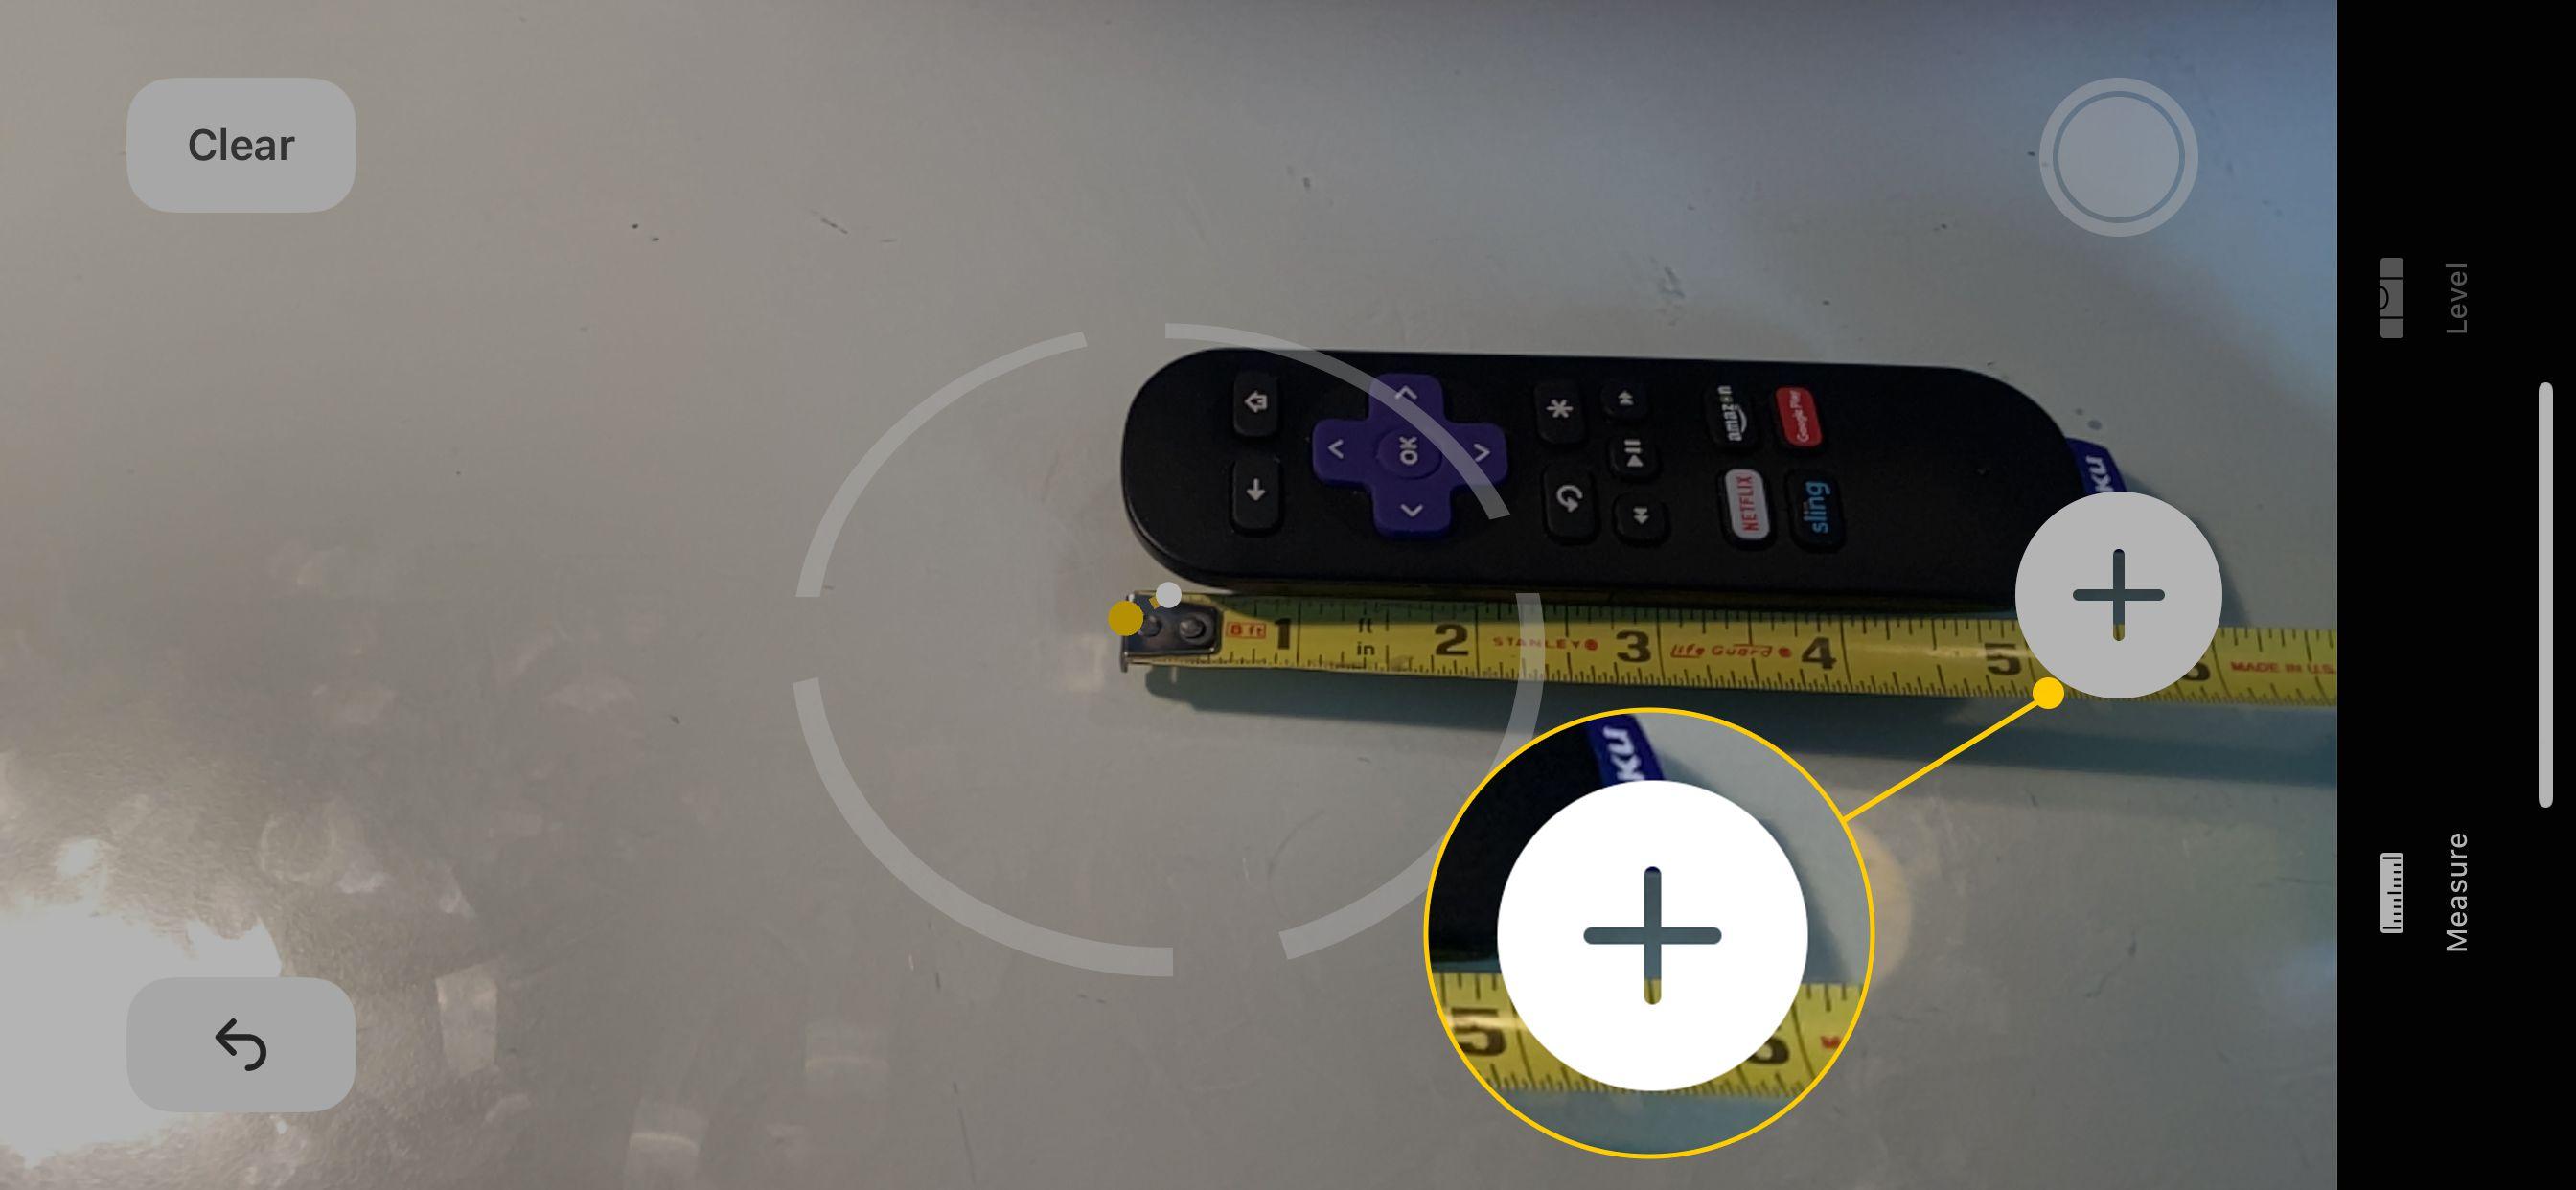 Plus button in Measure app